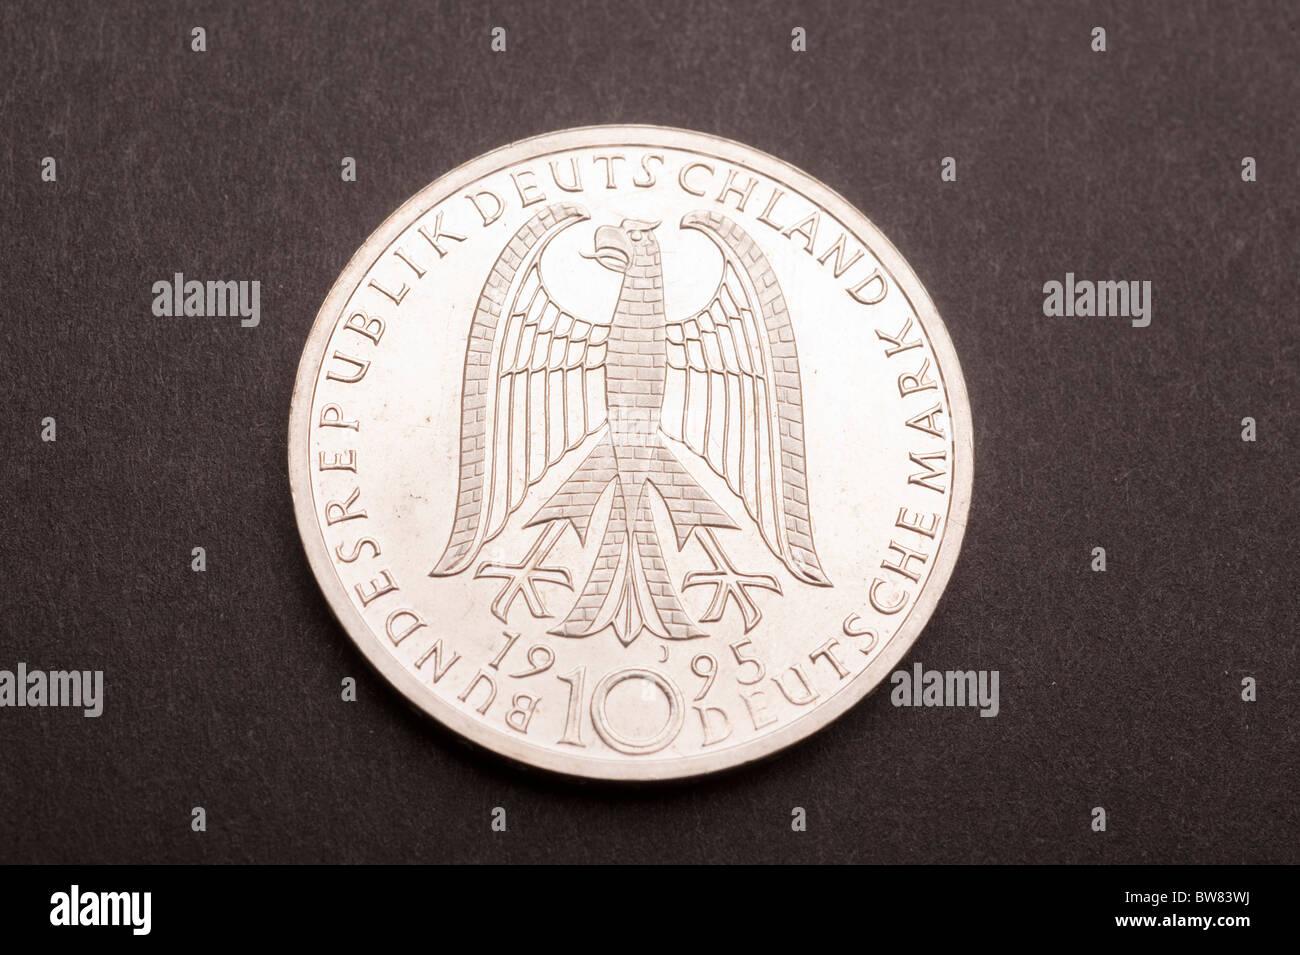 10 Deutsche Mark Münze Stockfoto Bild 32755454 Alamy